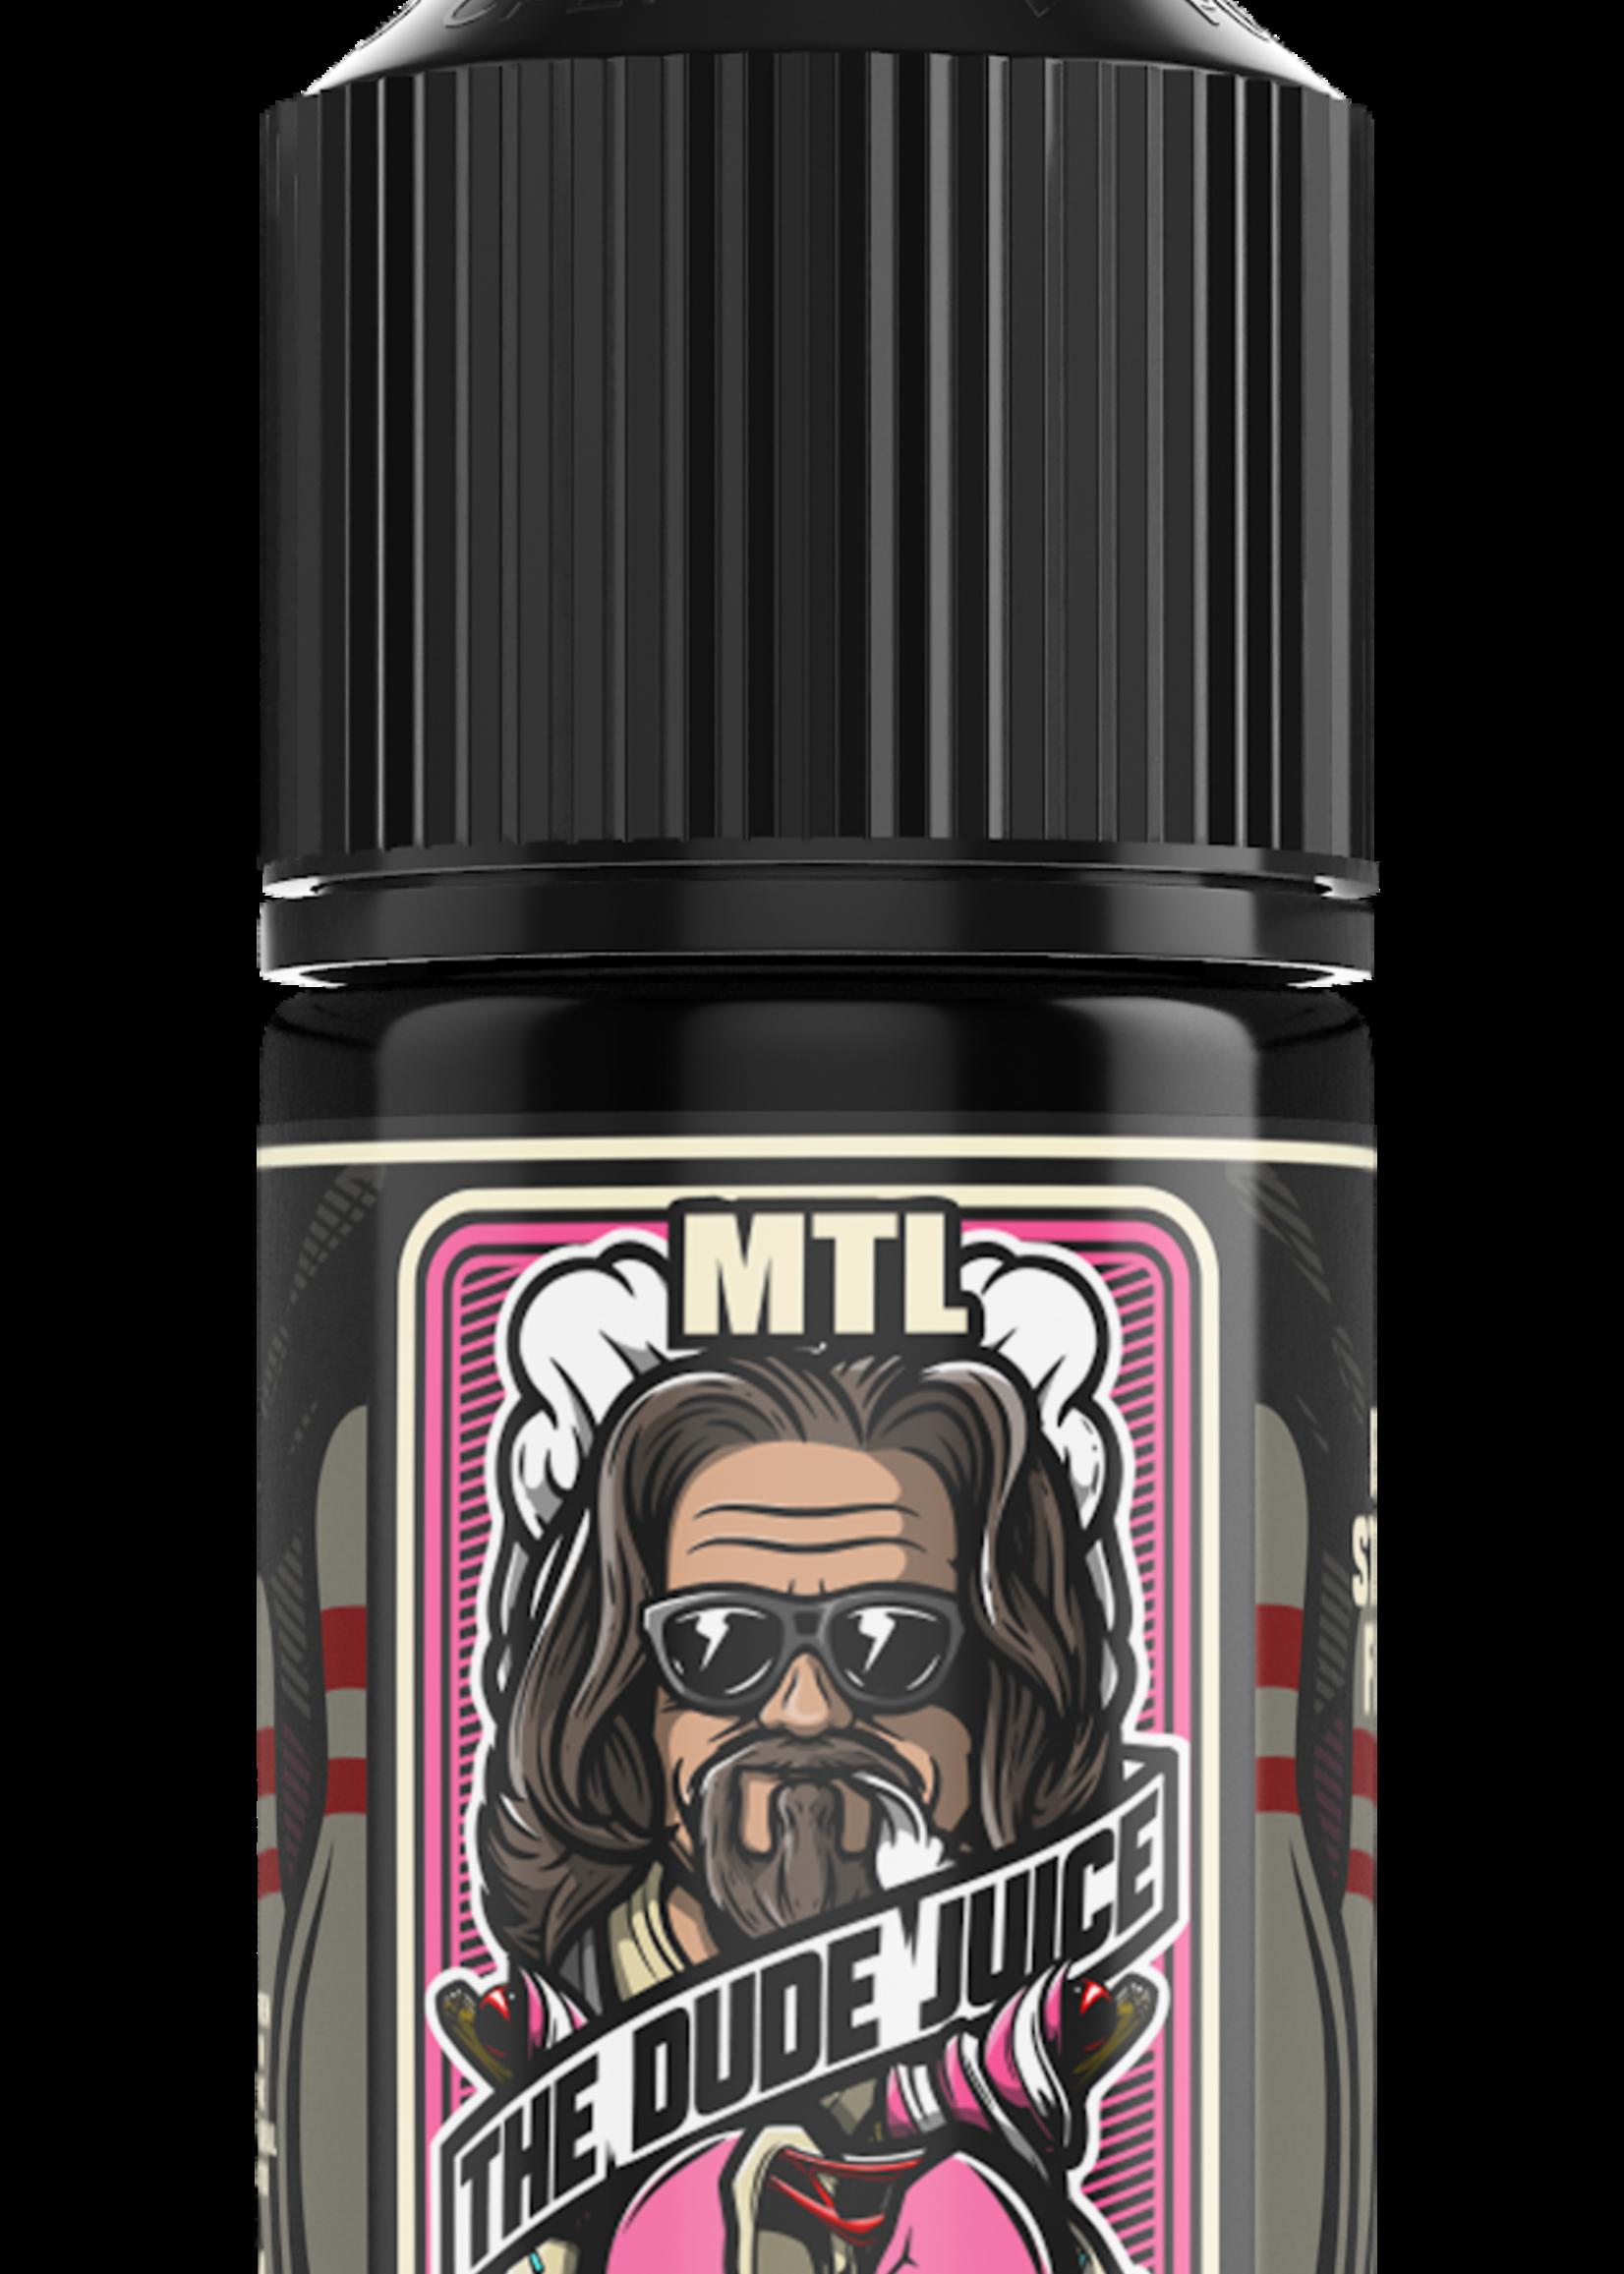 Vape flavour - The dude juice MTL 30ml- 12mg